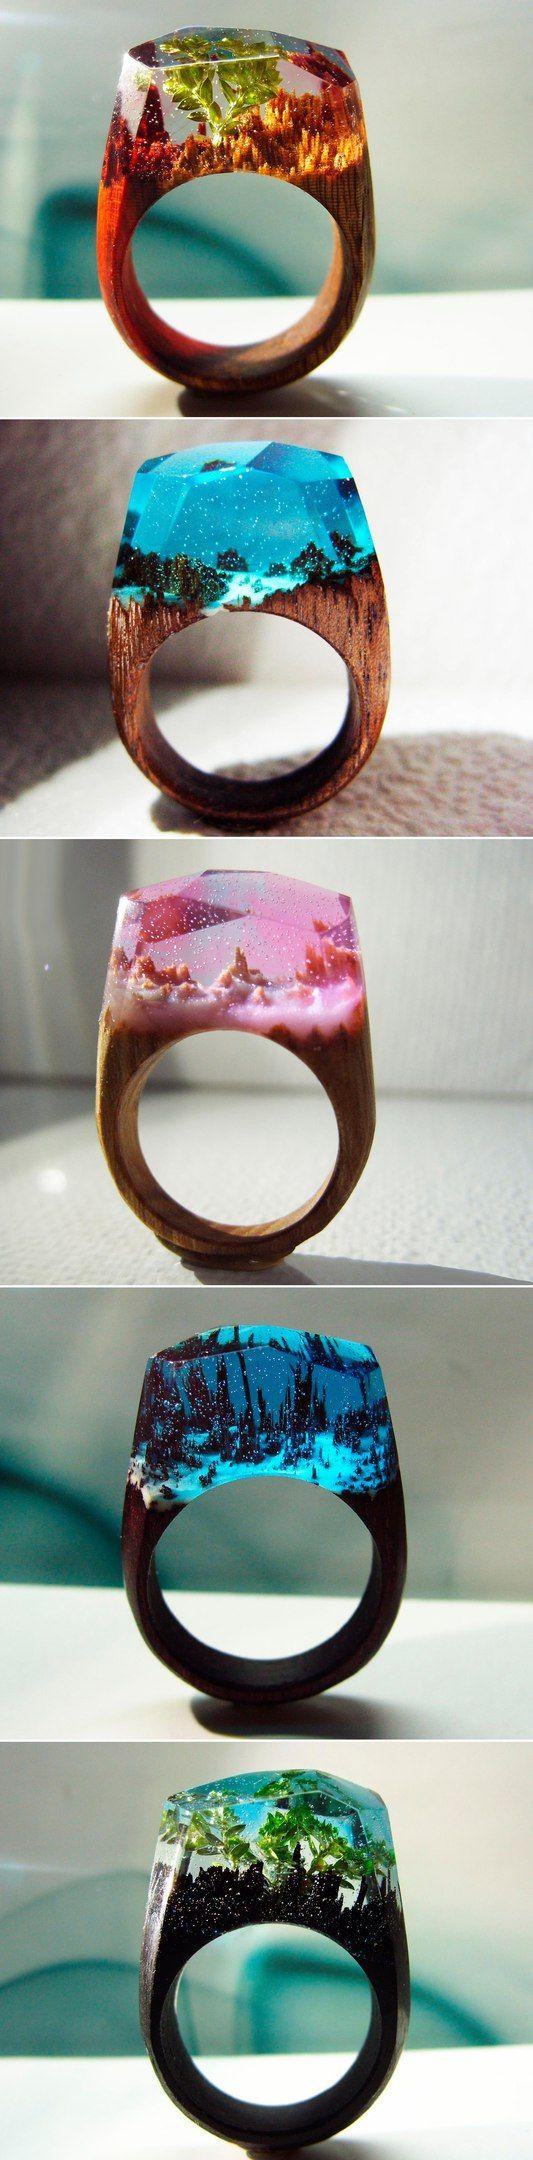 Wooden Rings   Деревянные кольца